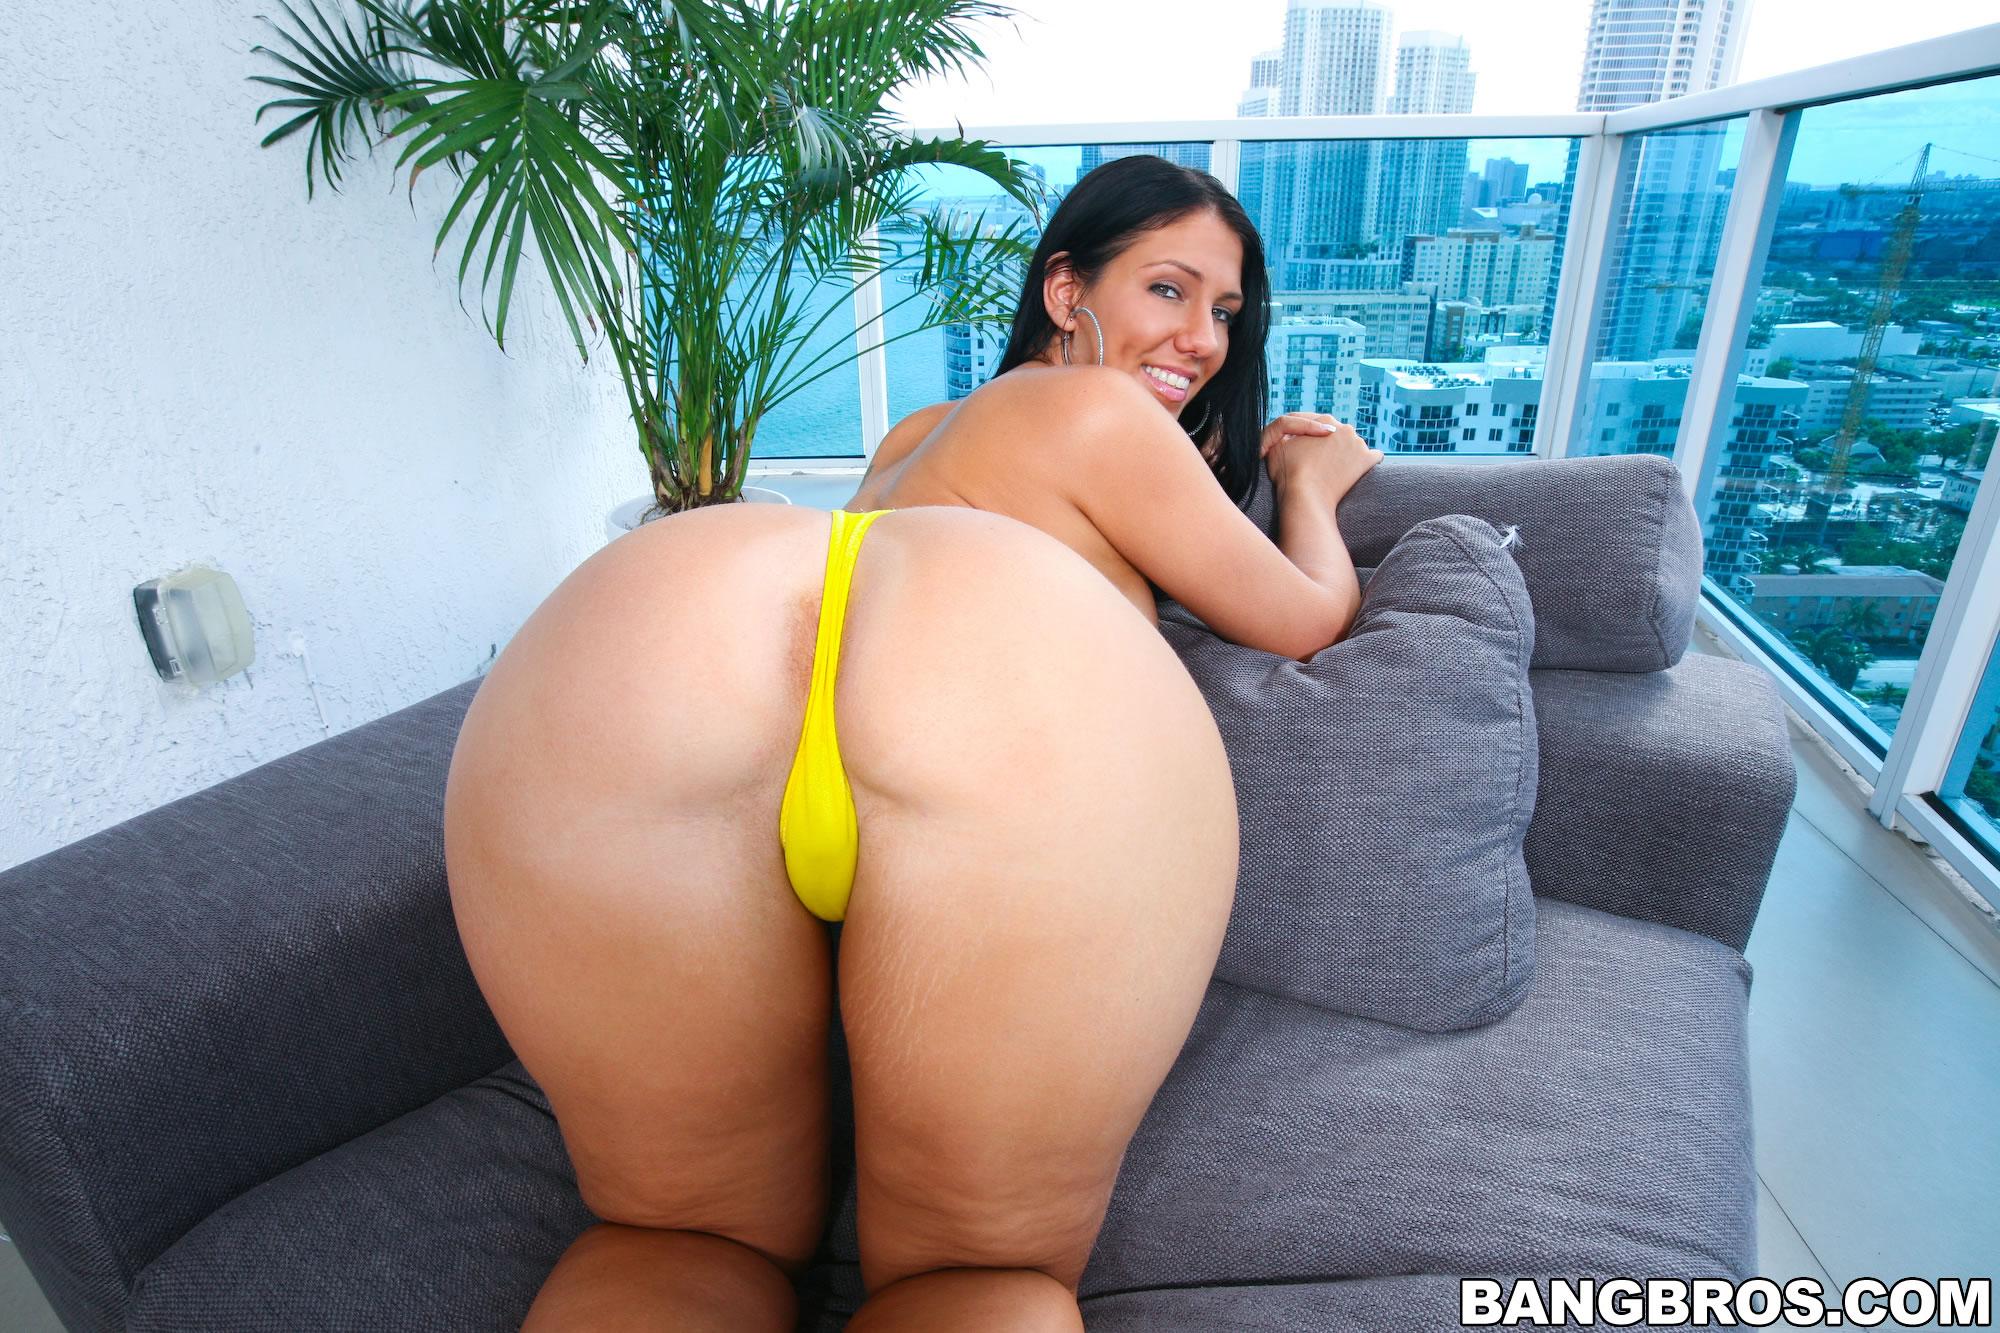 Fat ass philippines